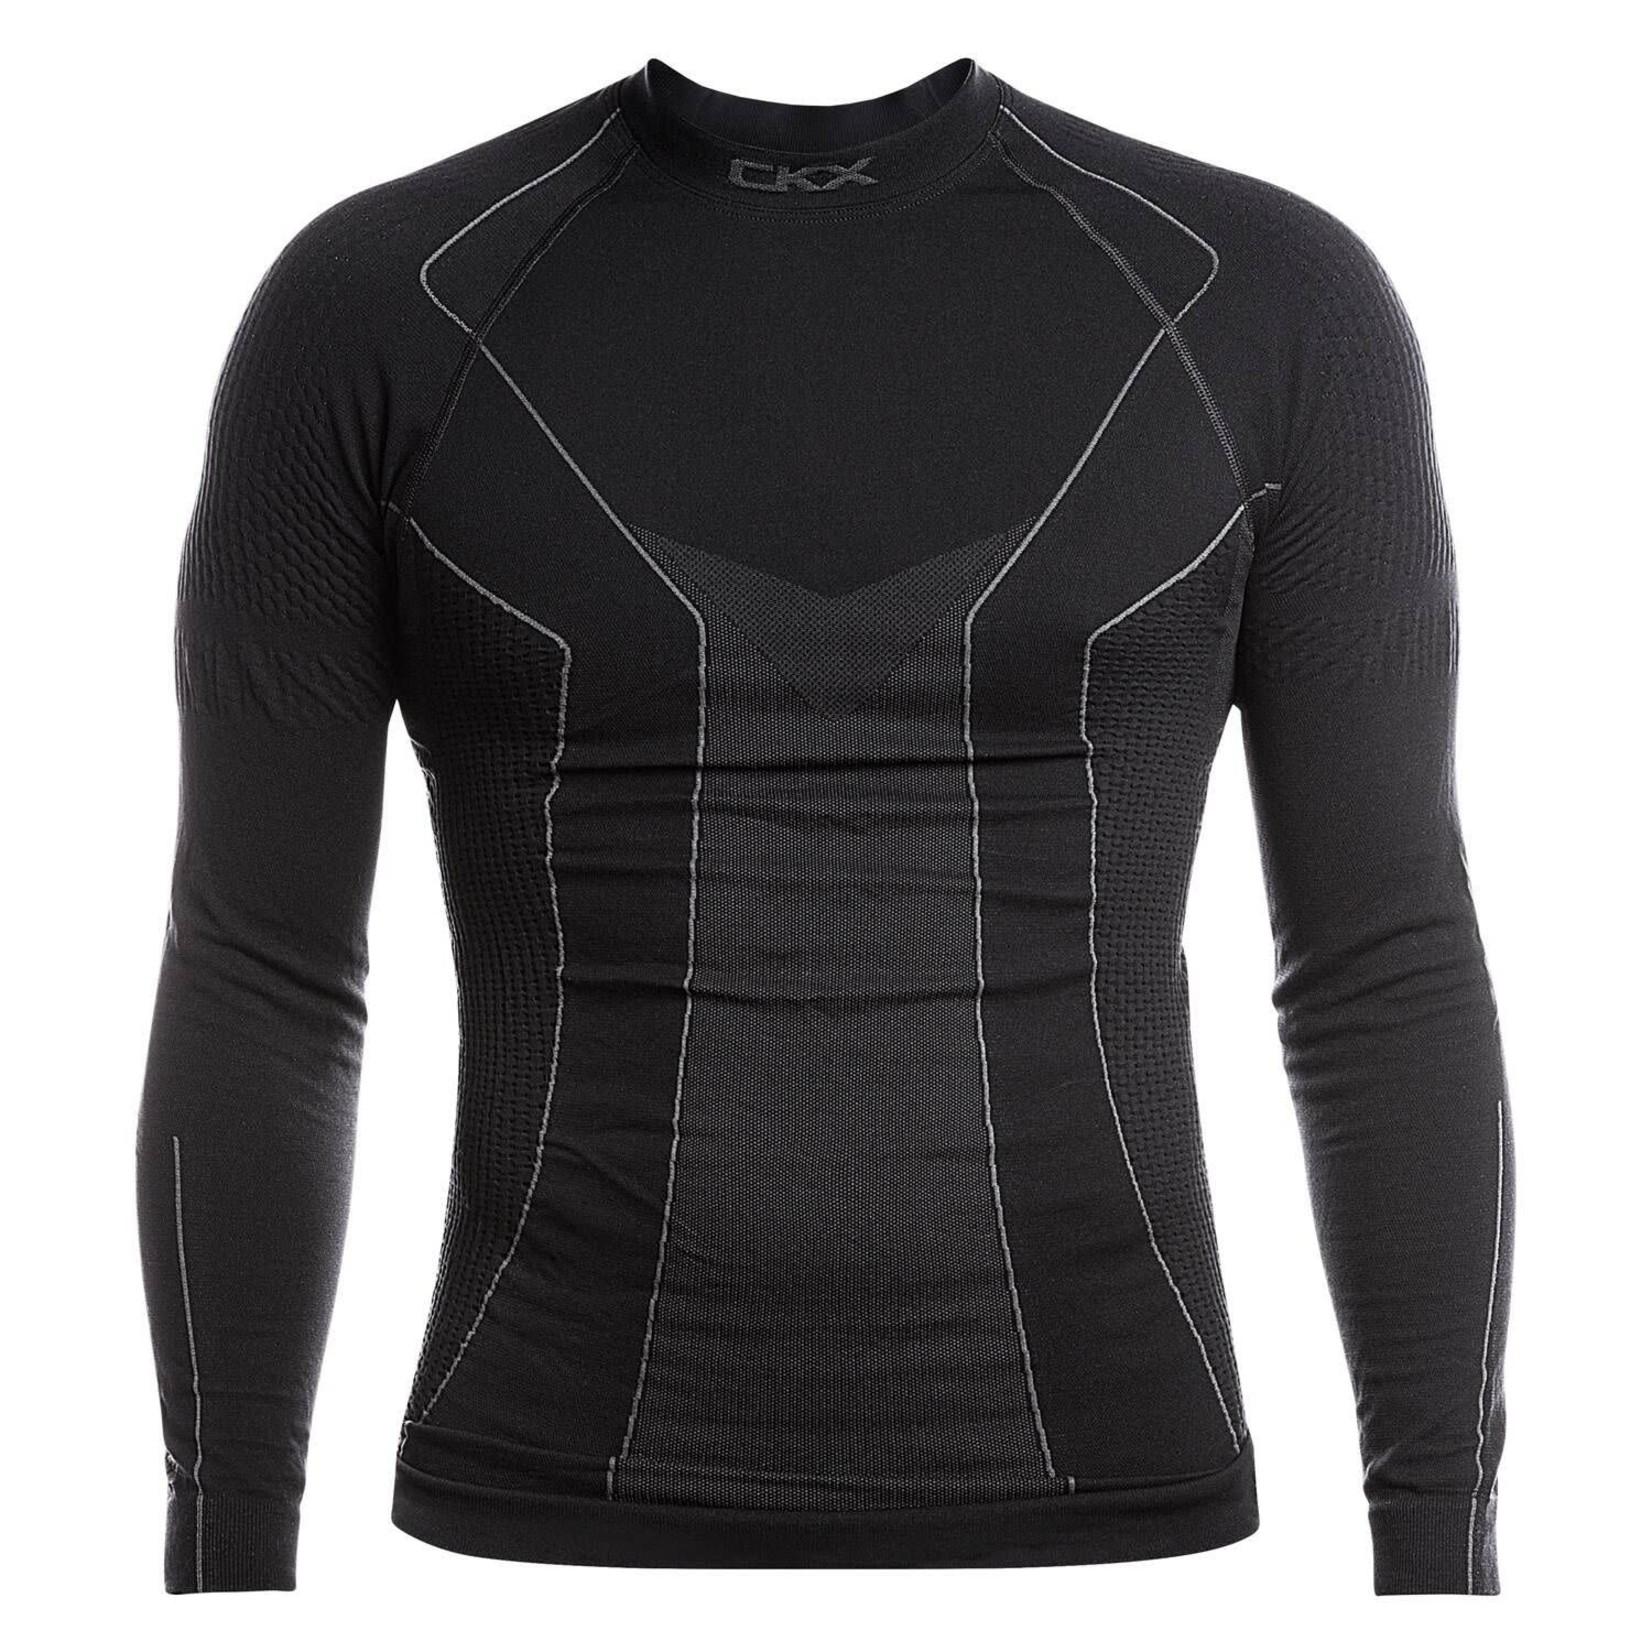 CKX CKX Thermal Underwear - Top - L/XL